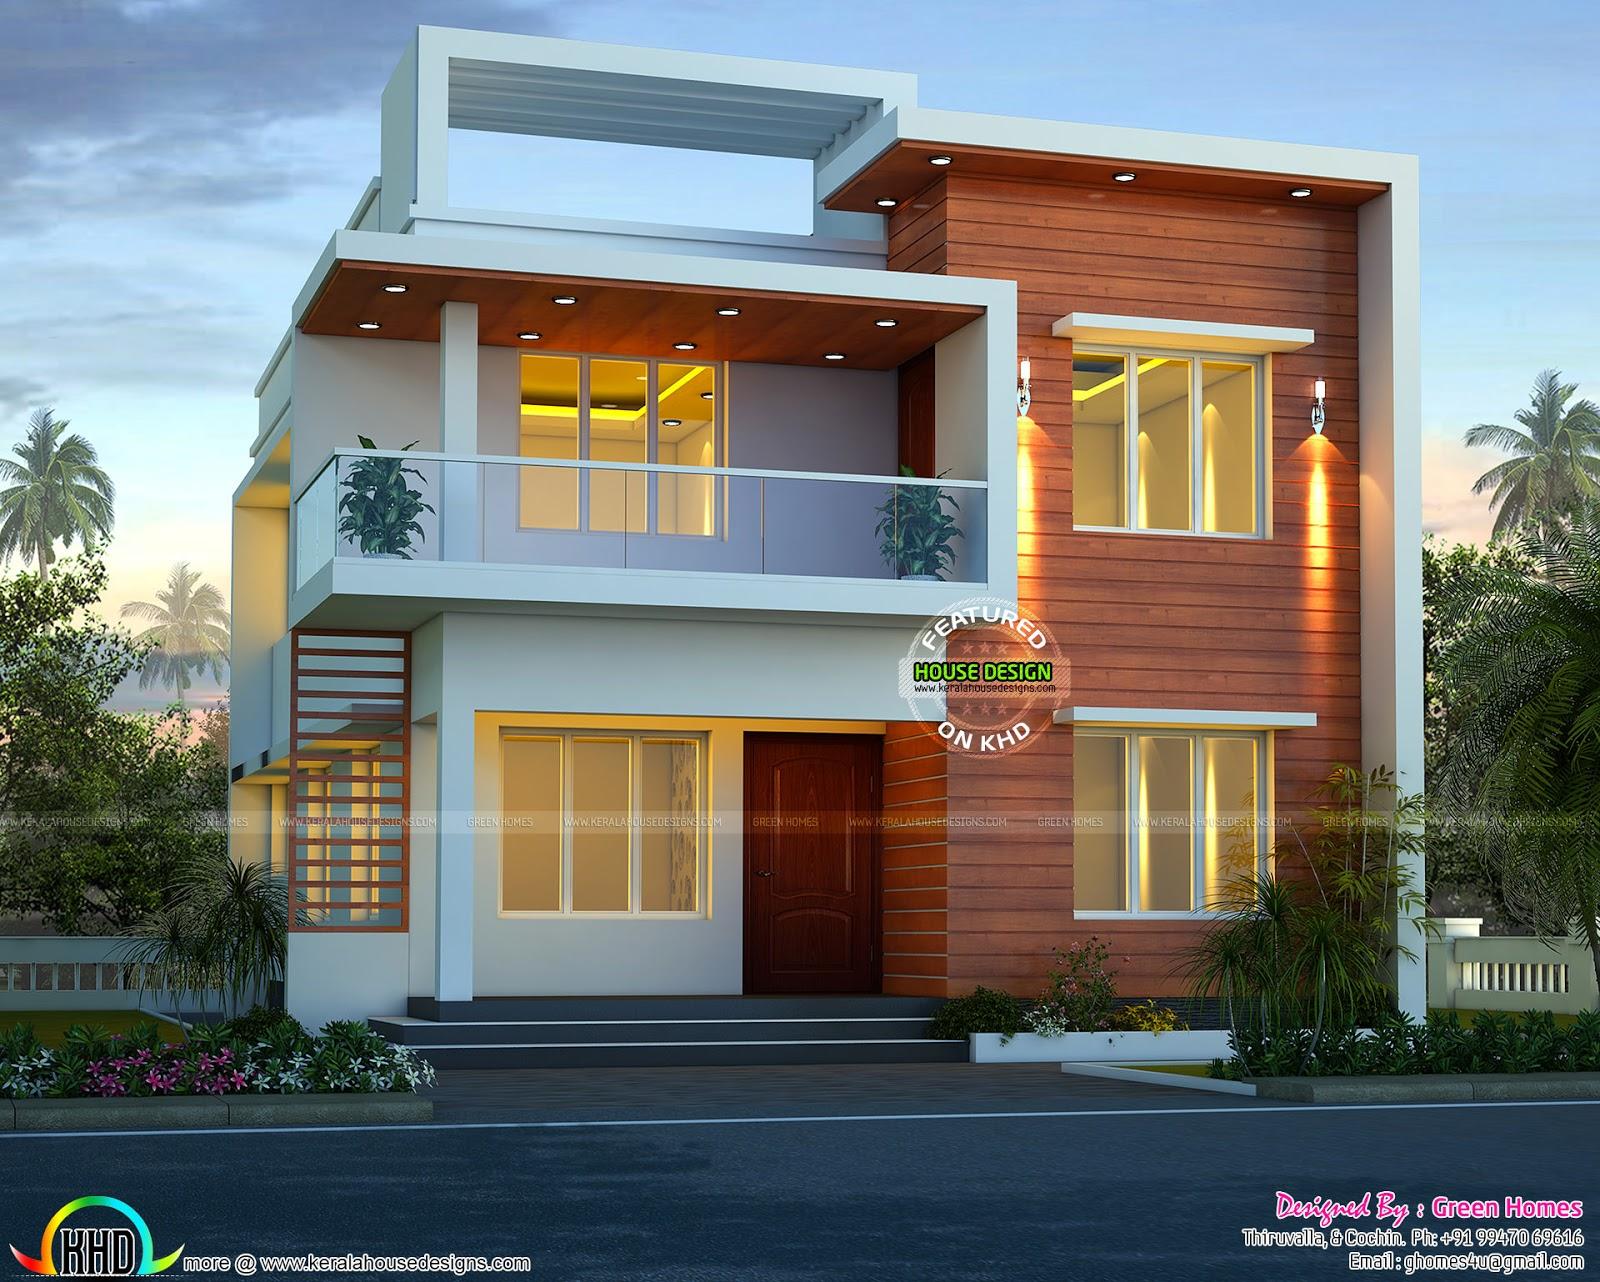 Kerala home design and floor plans: Cute modern house ...